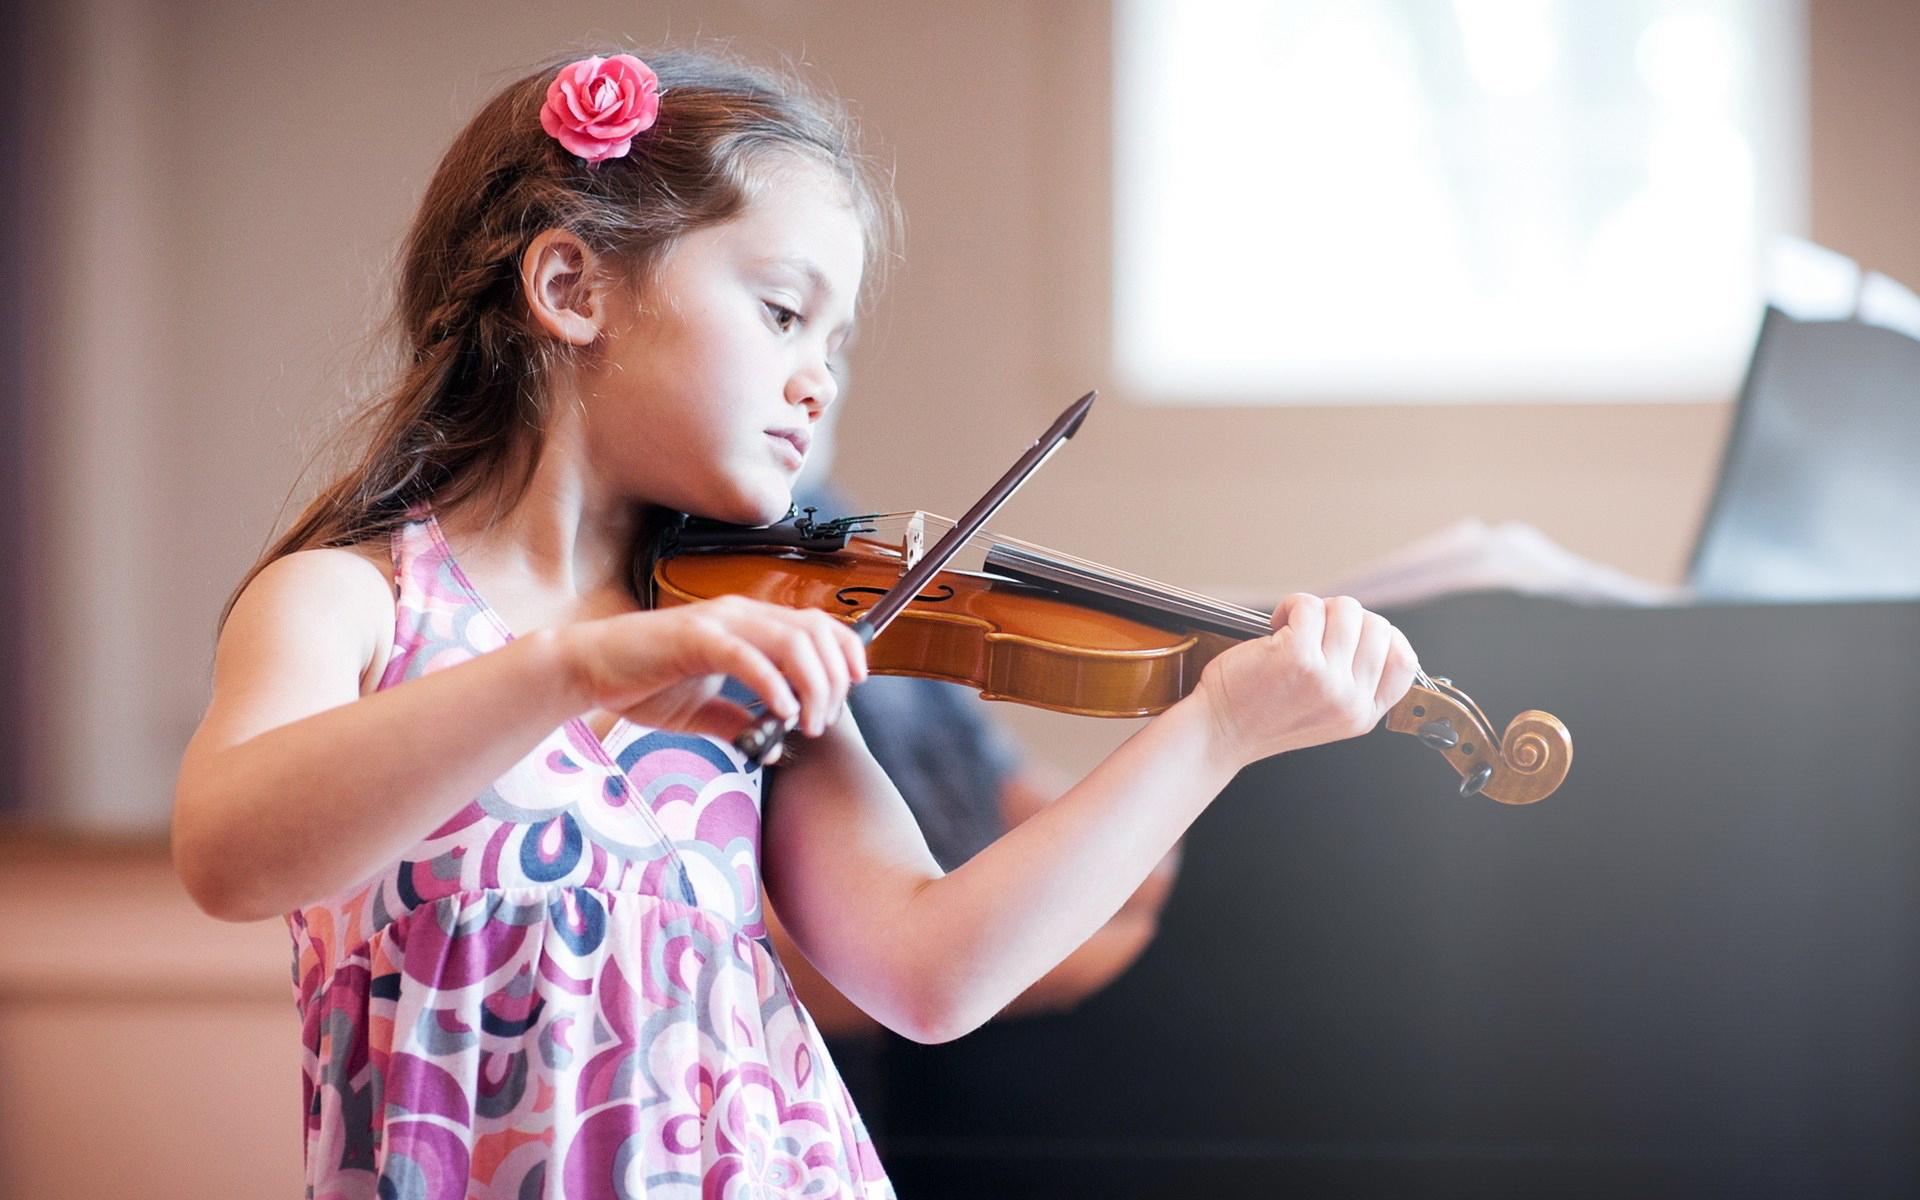 girl-child-violin-music-wallpaper-1920x1200-copy